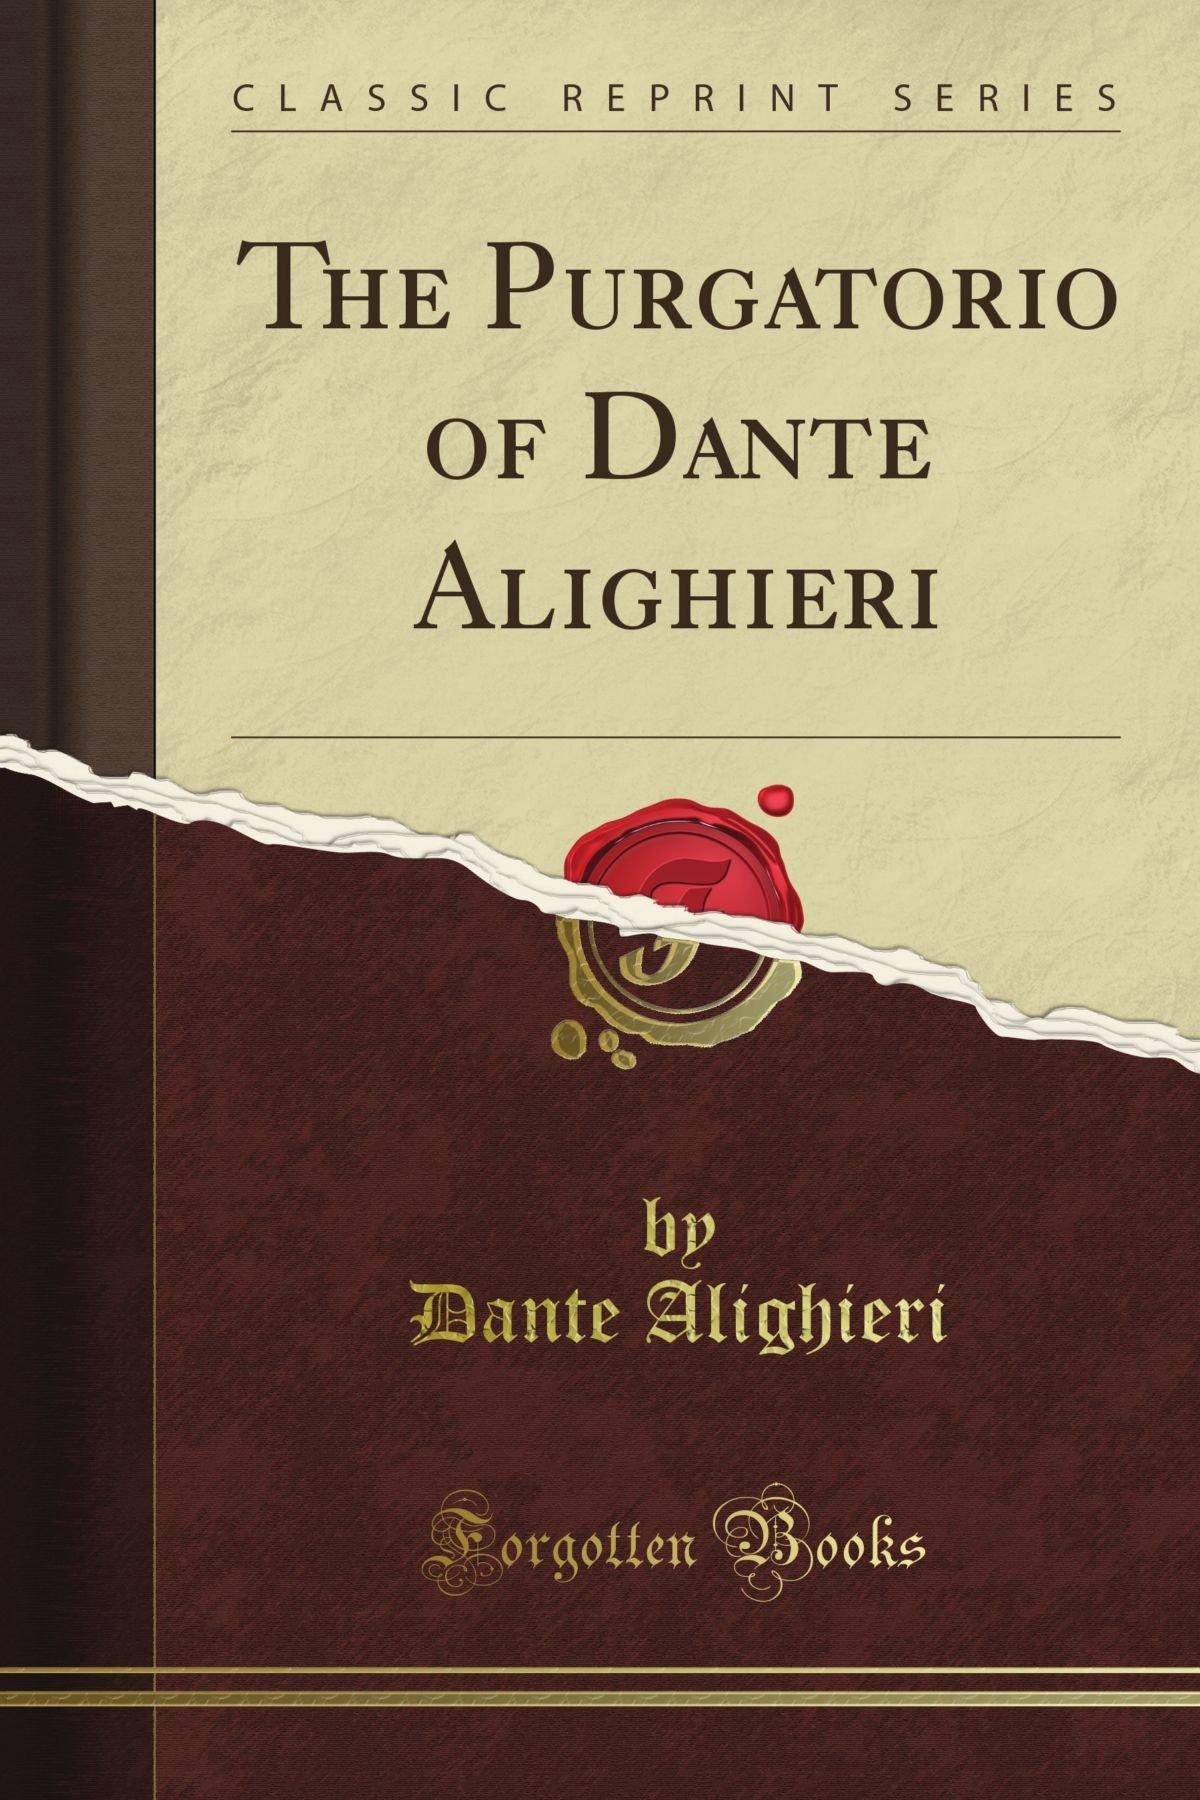 Read Online The Purgatorio of Dante Alighieri (Classic Reprint) pdf